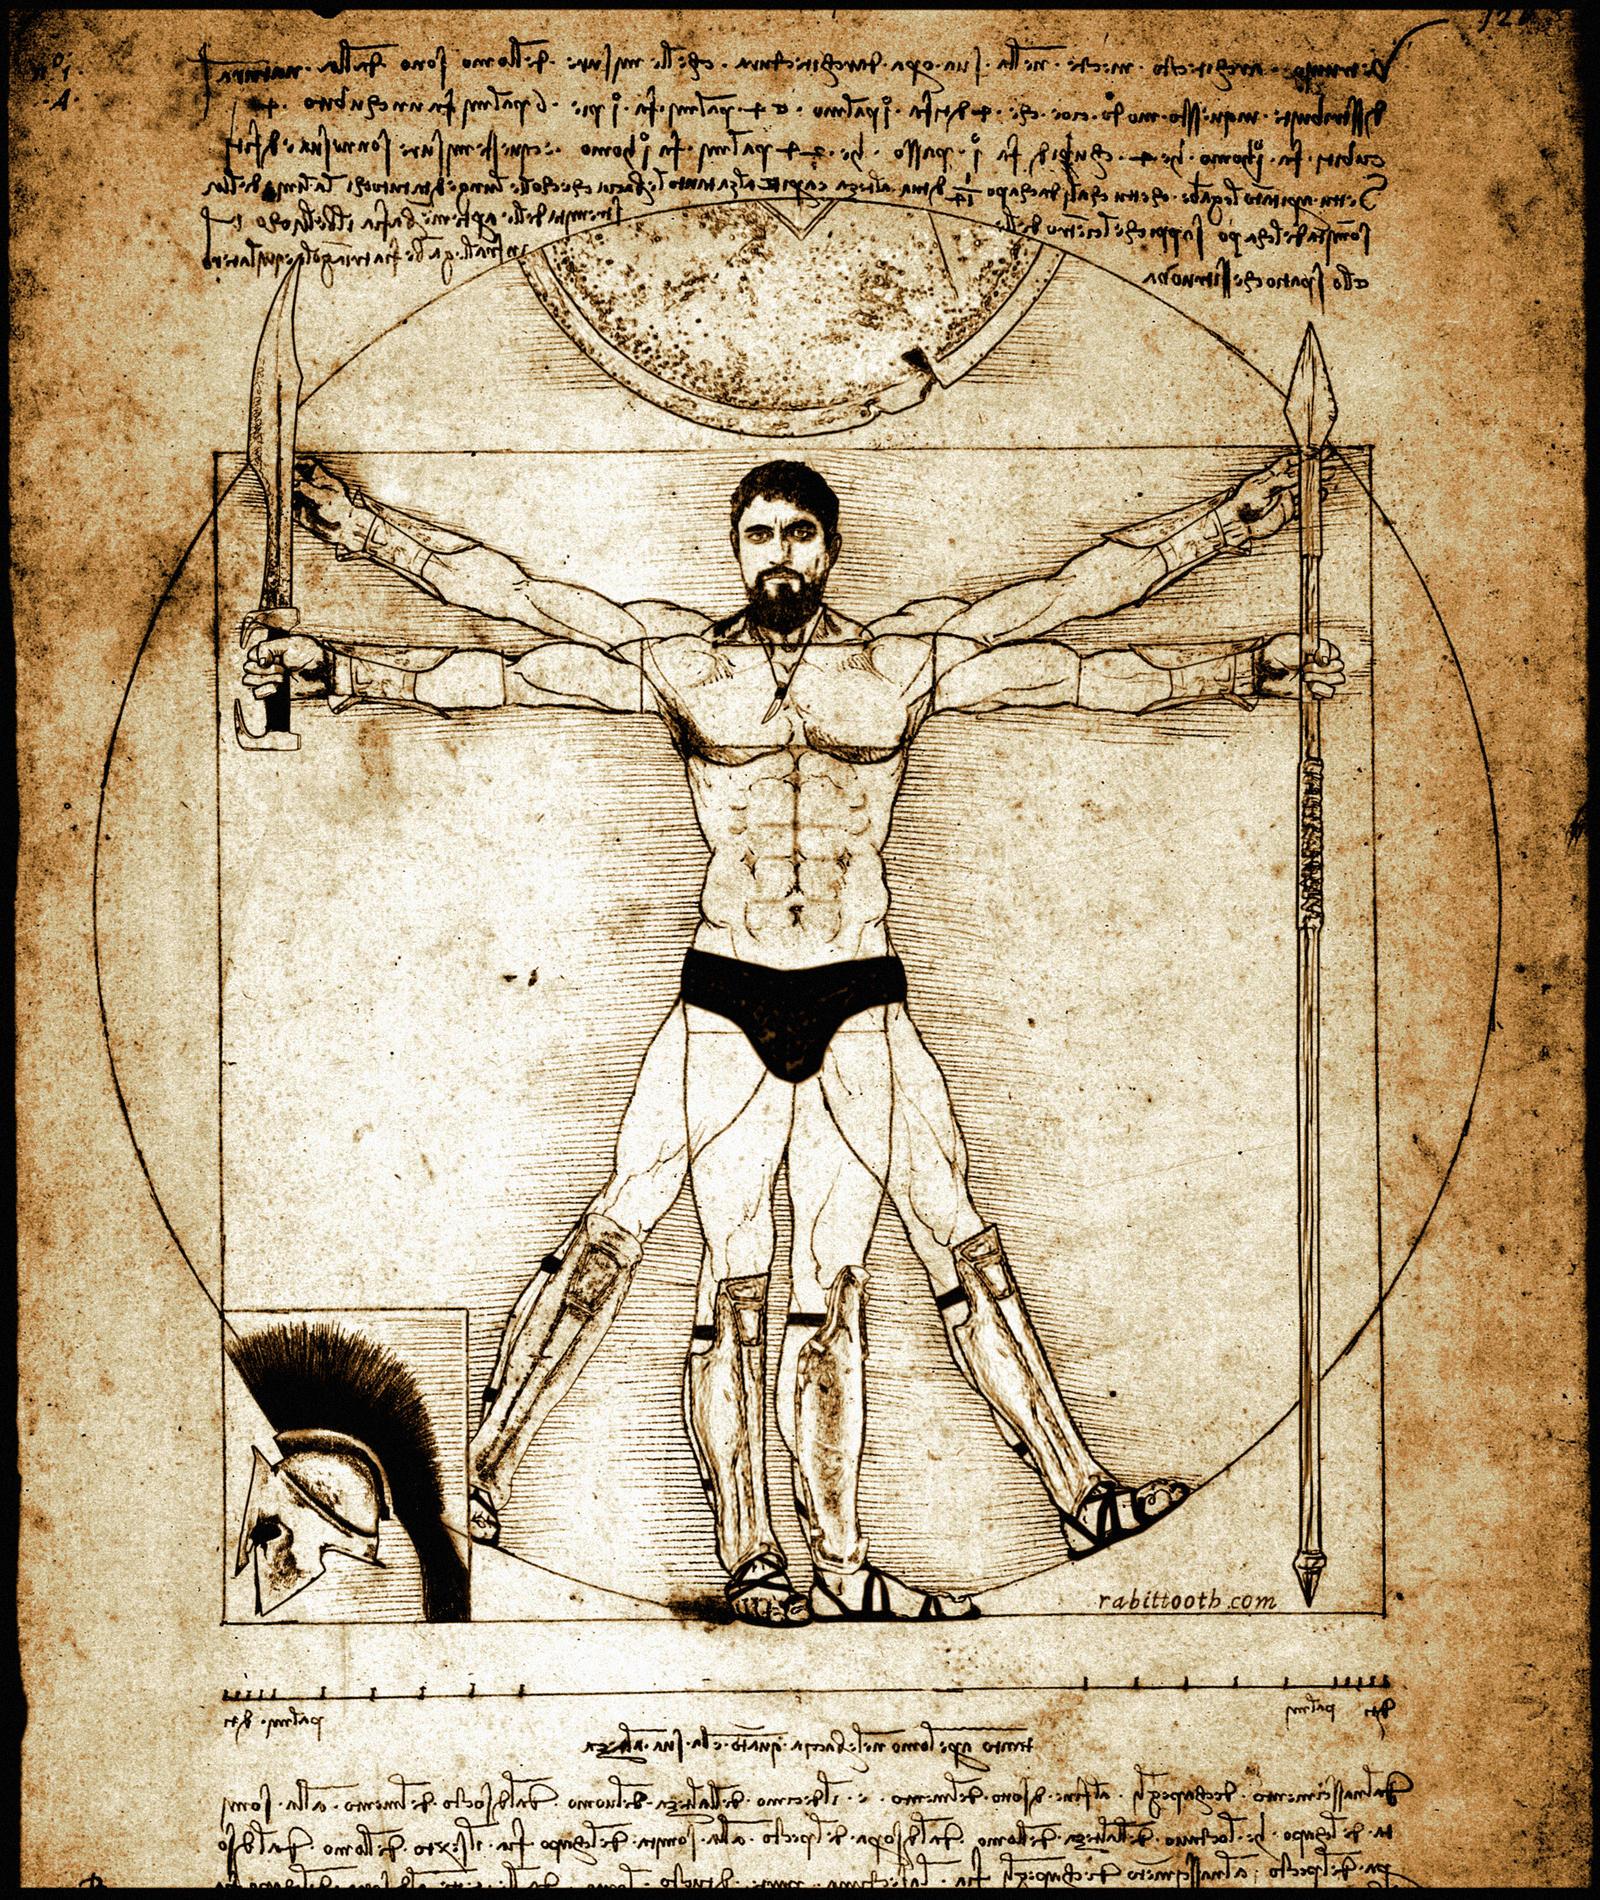 King Leonidas da Vinci Vitruvian Man by Rabittooth